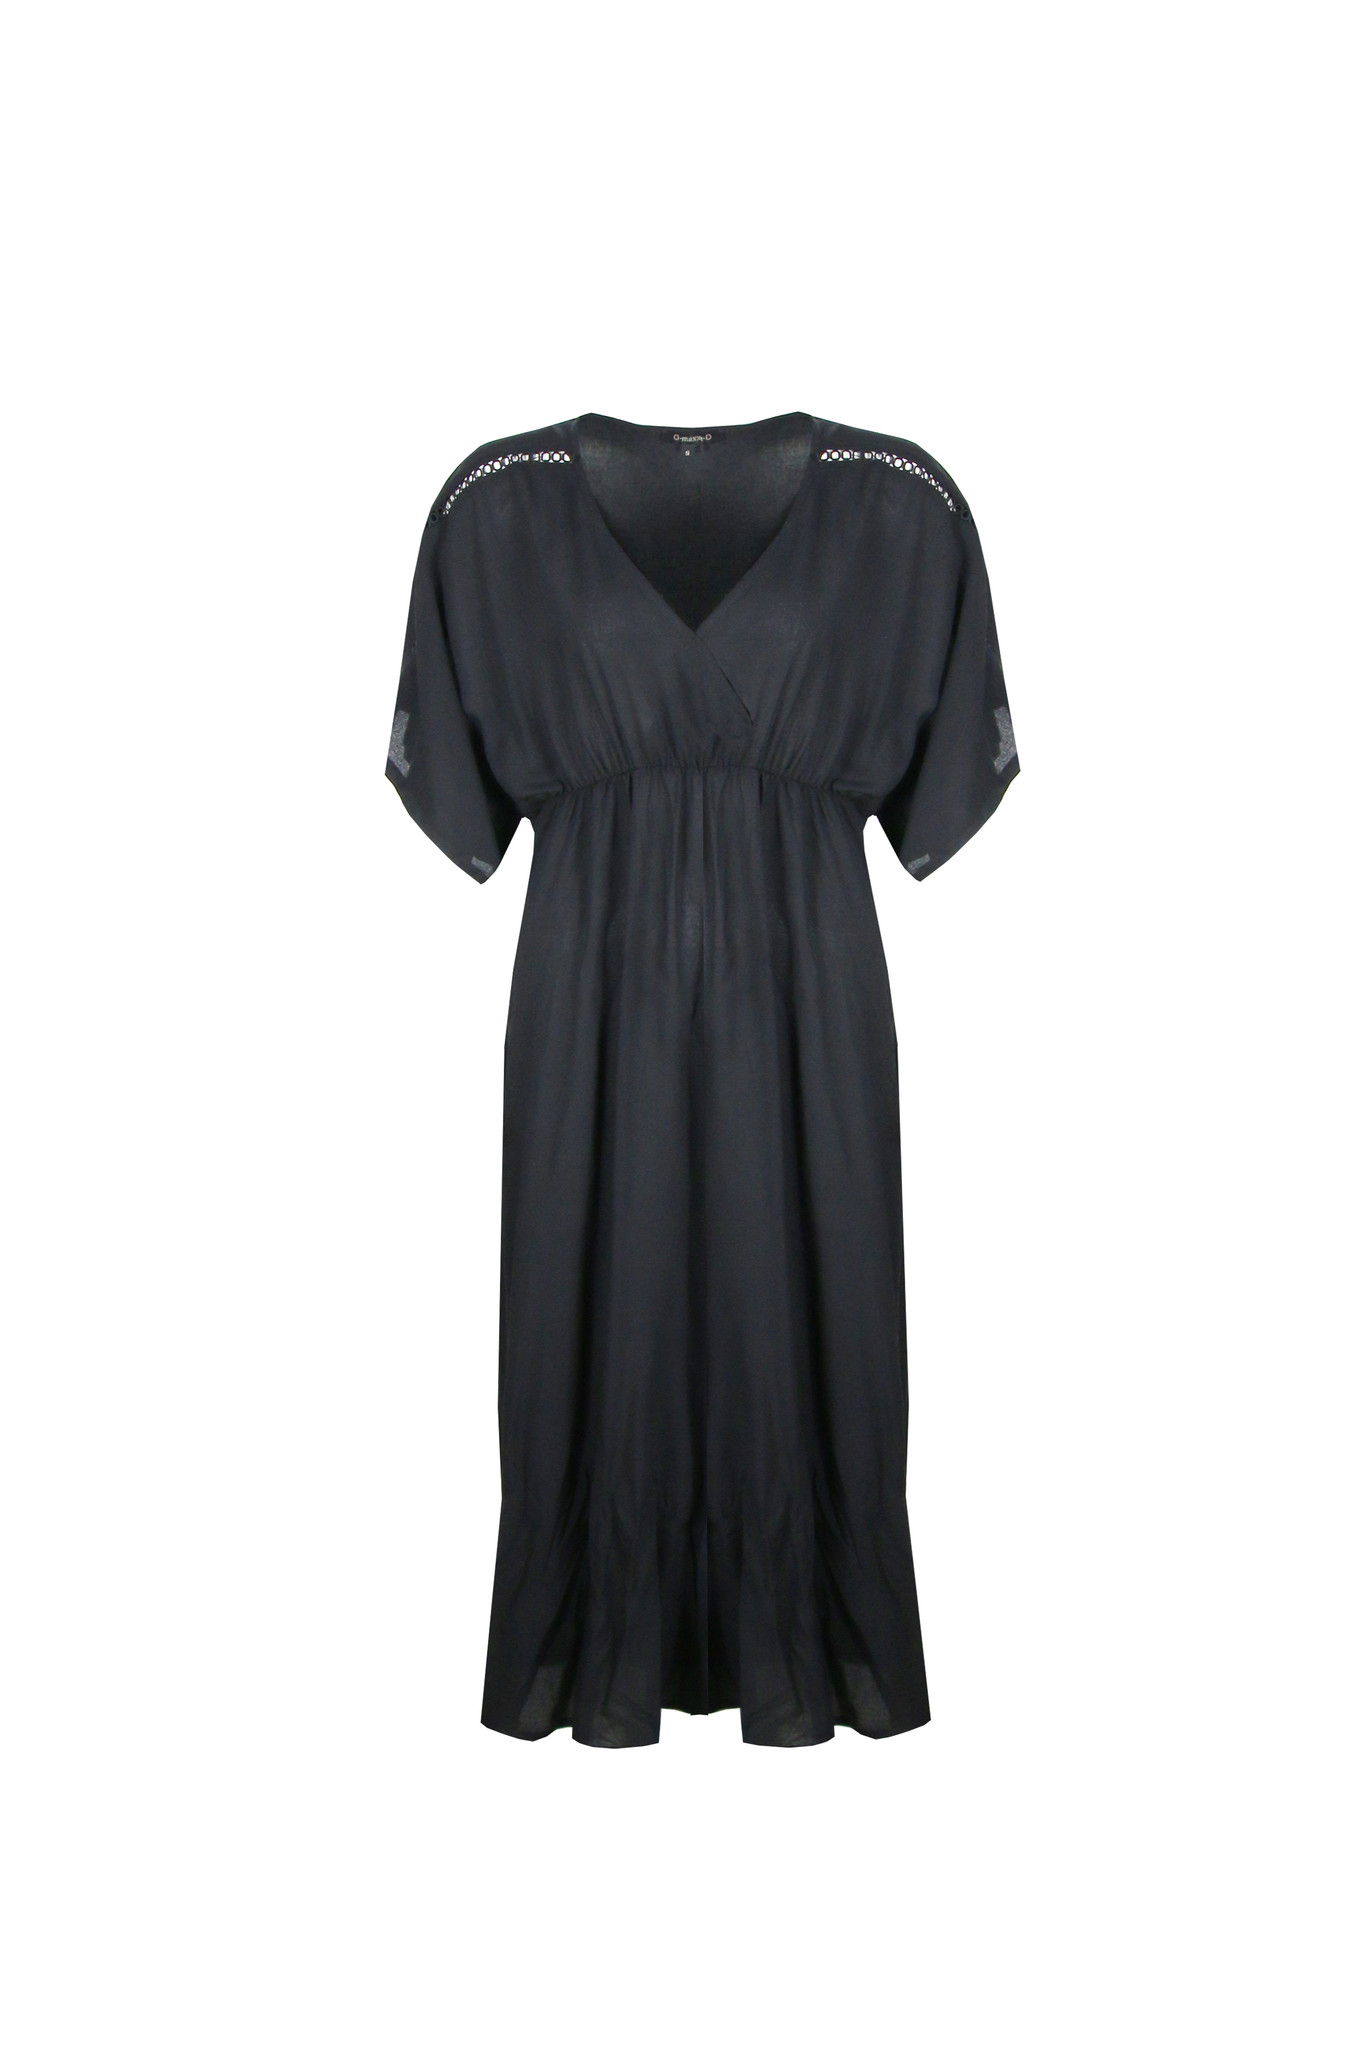 G-Maxx G-Maxx jurk Eboni zwart